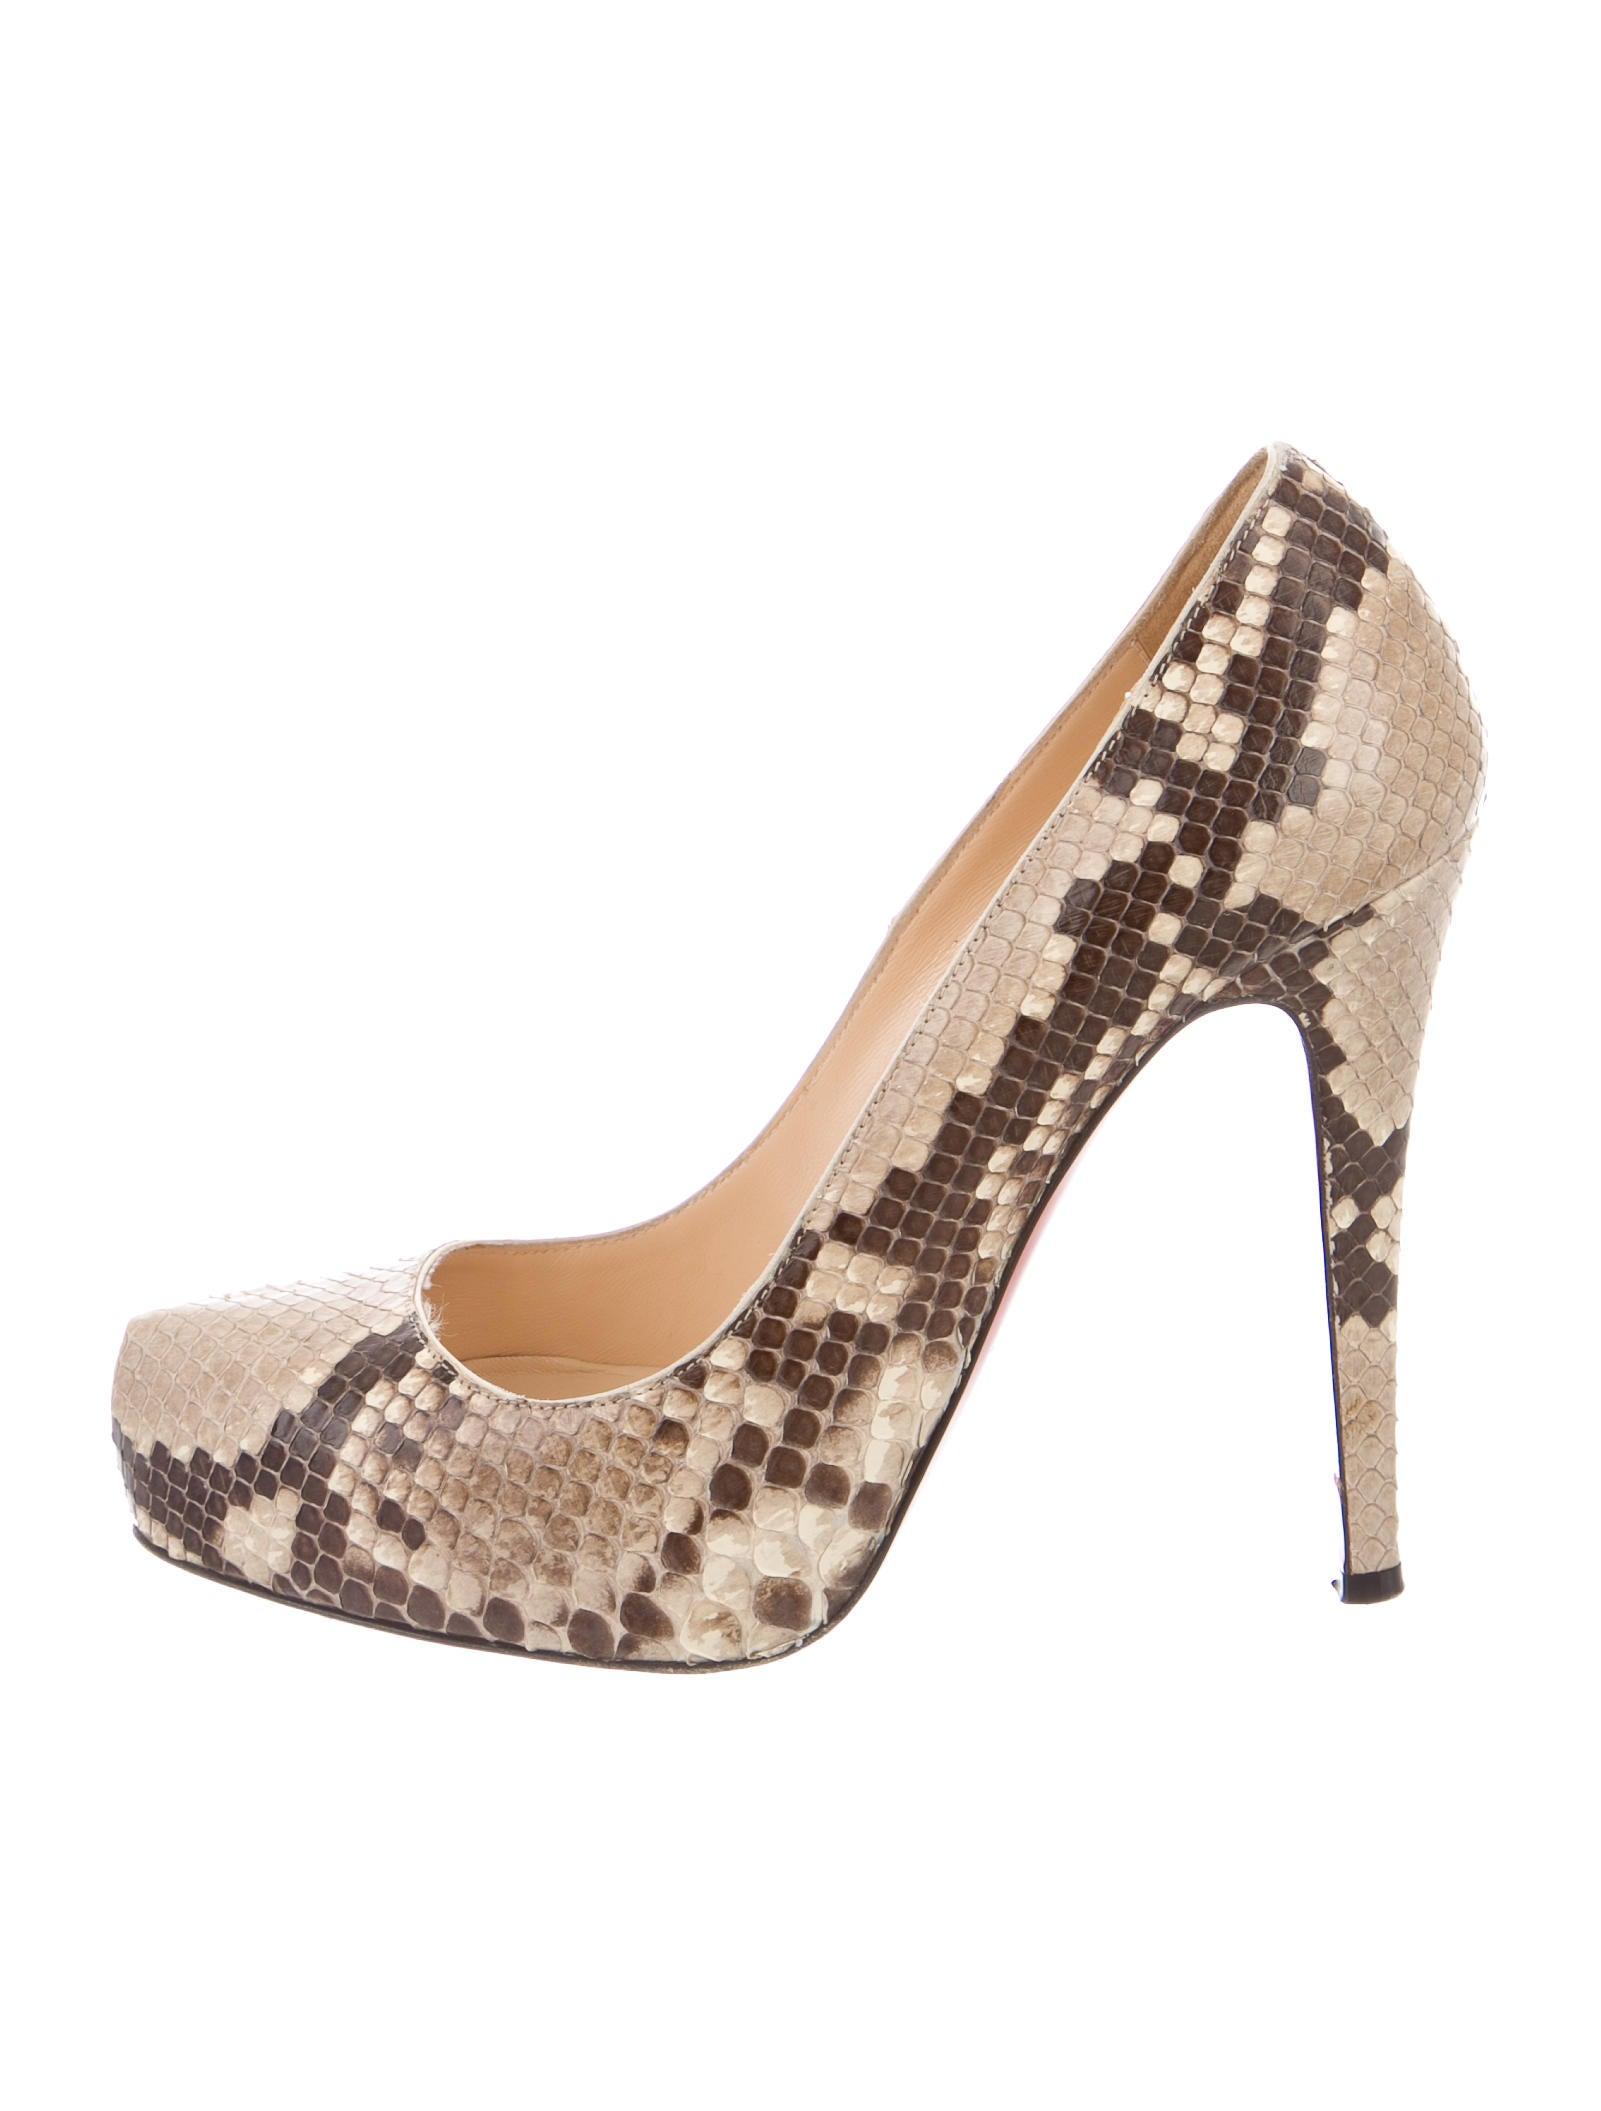 Christian Louboutin Snakeskin Platform Pumps Shoes